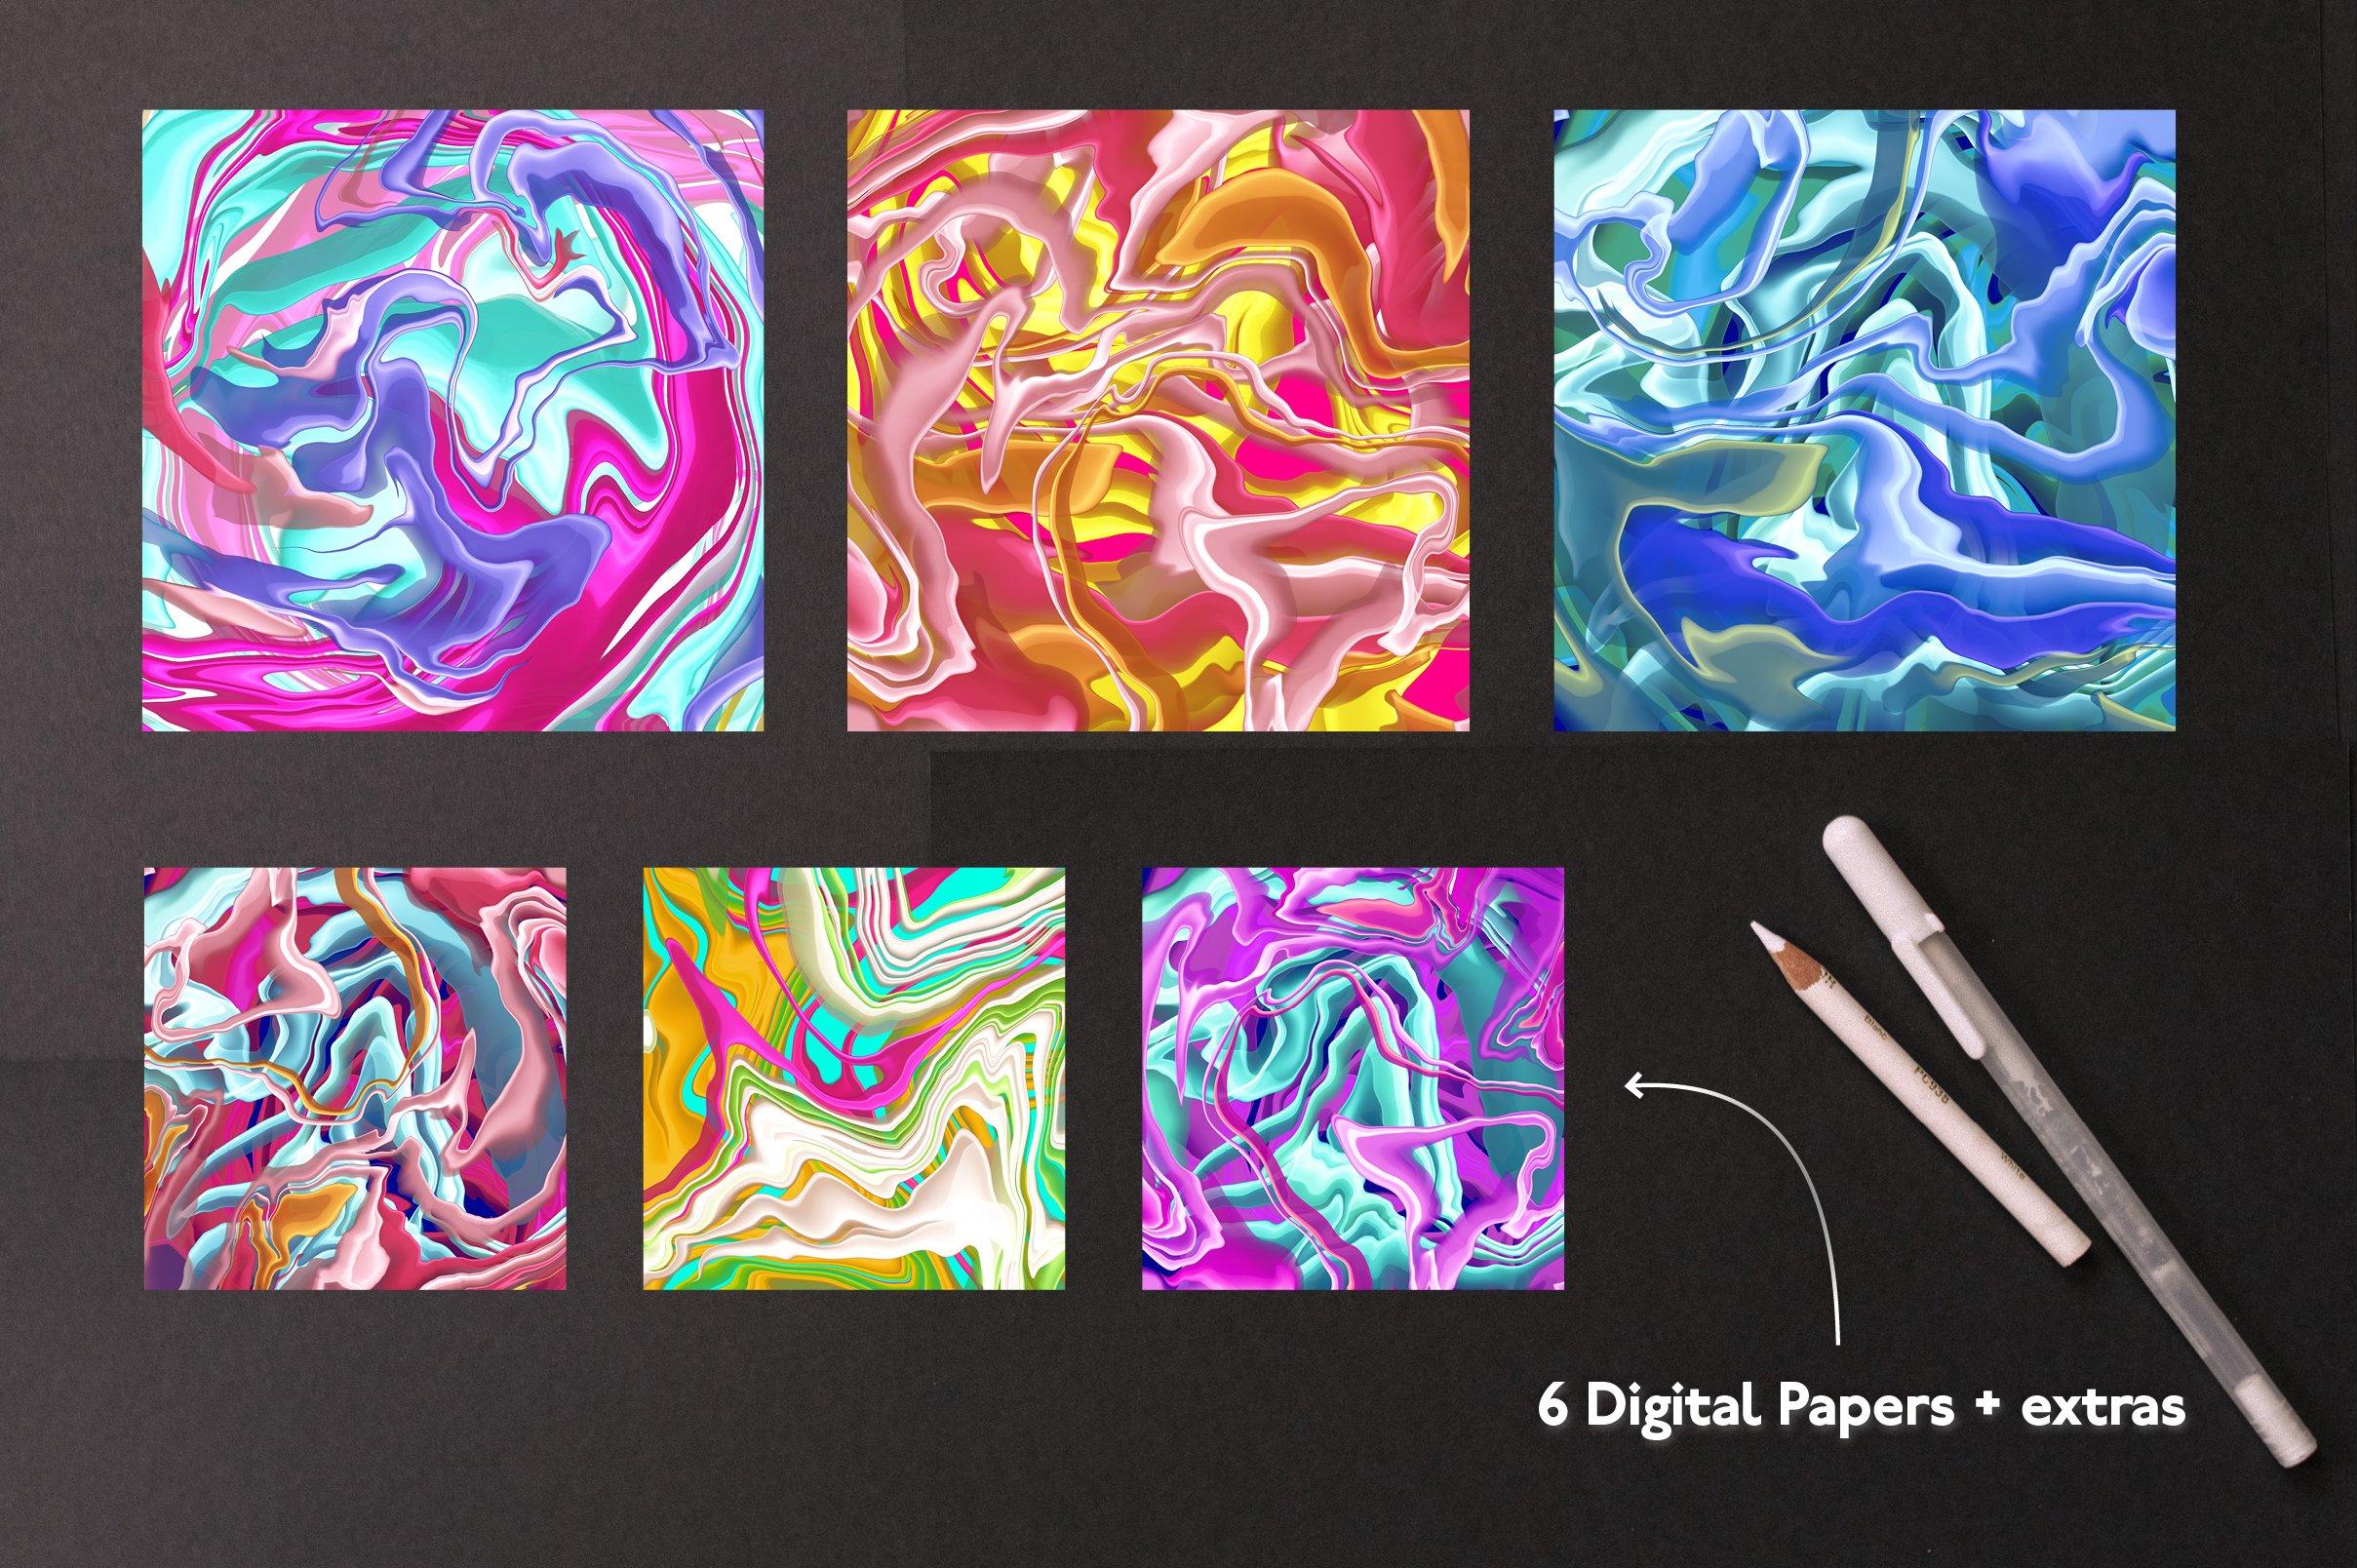 大理石纹理Procreate笔刷 Liquid Marble Texture Brush Bundle Noise插图(3)